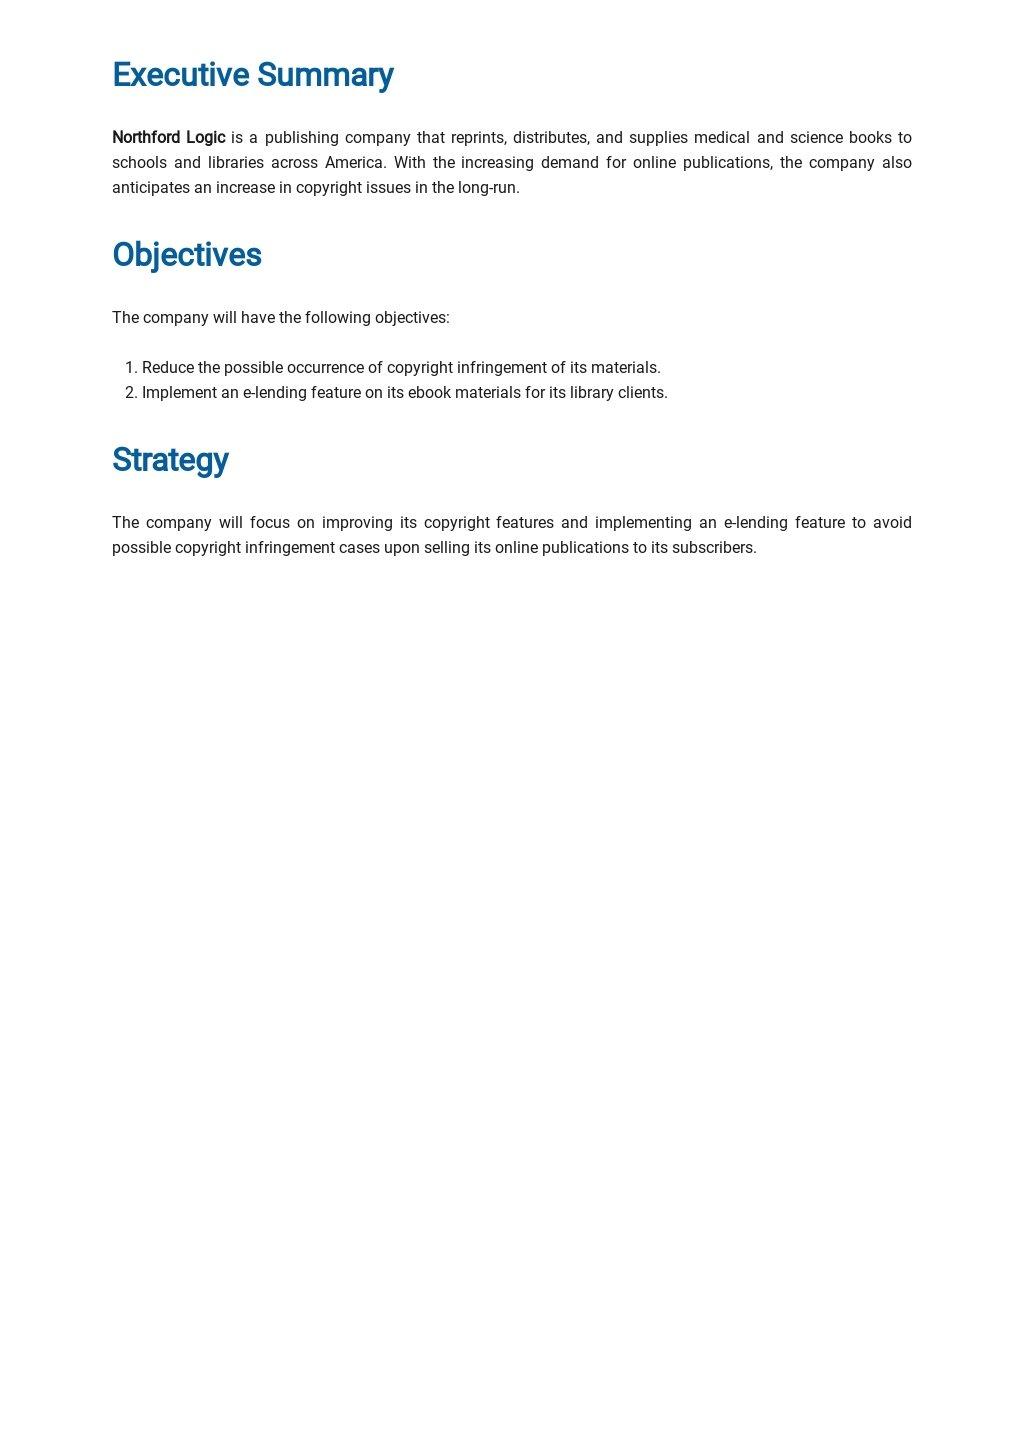 Legal Strategic Plan Template 1.jpe